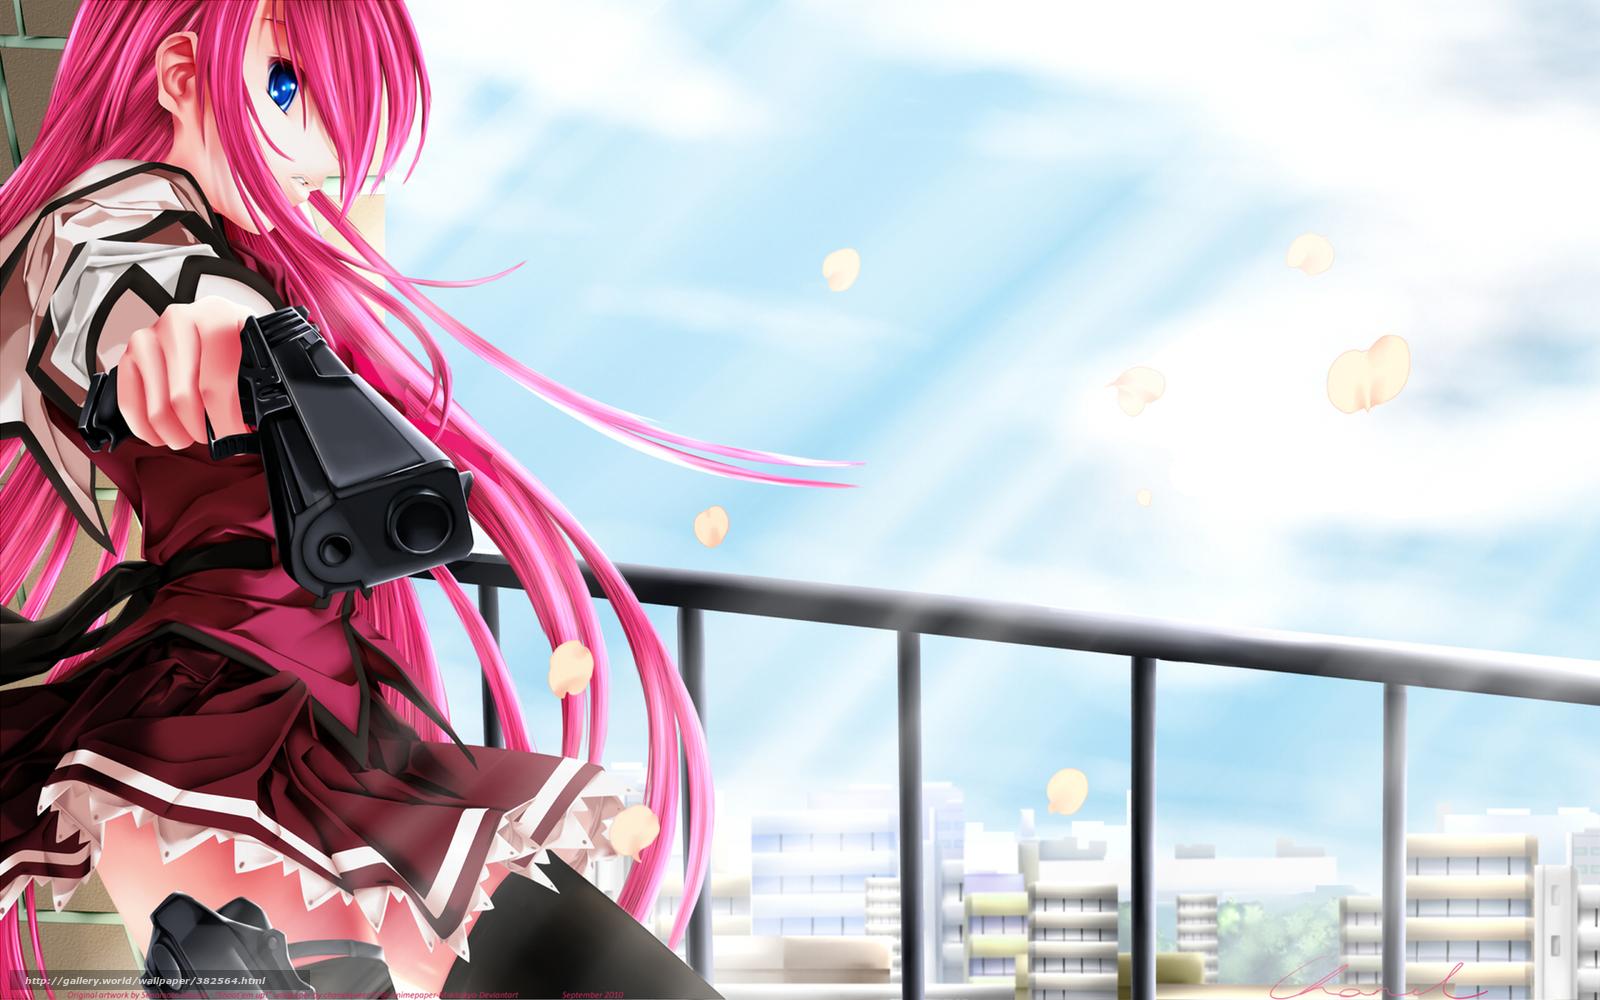 Download Wallpaper Girl, View, Pink Hair, School Uniform - Anime Girl With Guns - HD Wallpaper